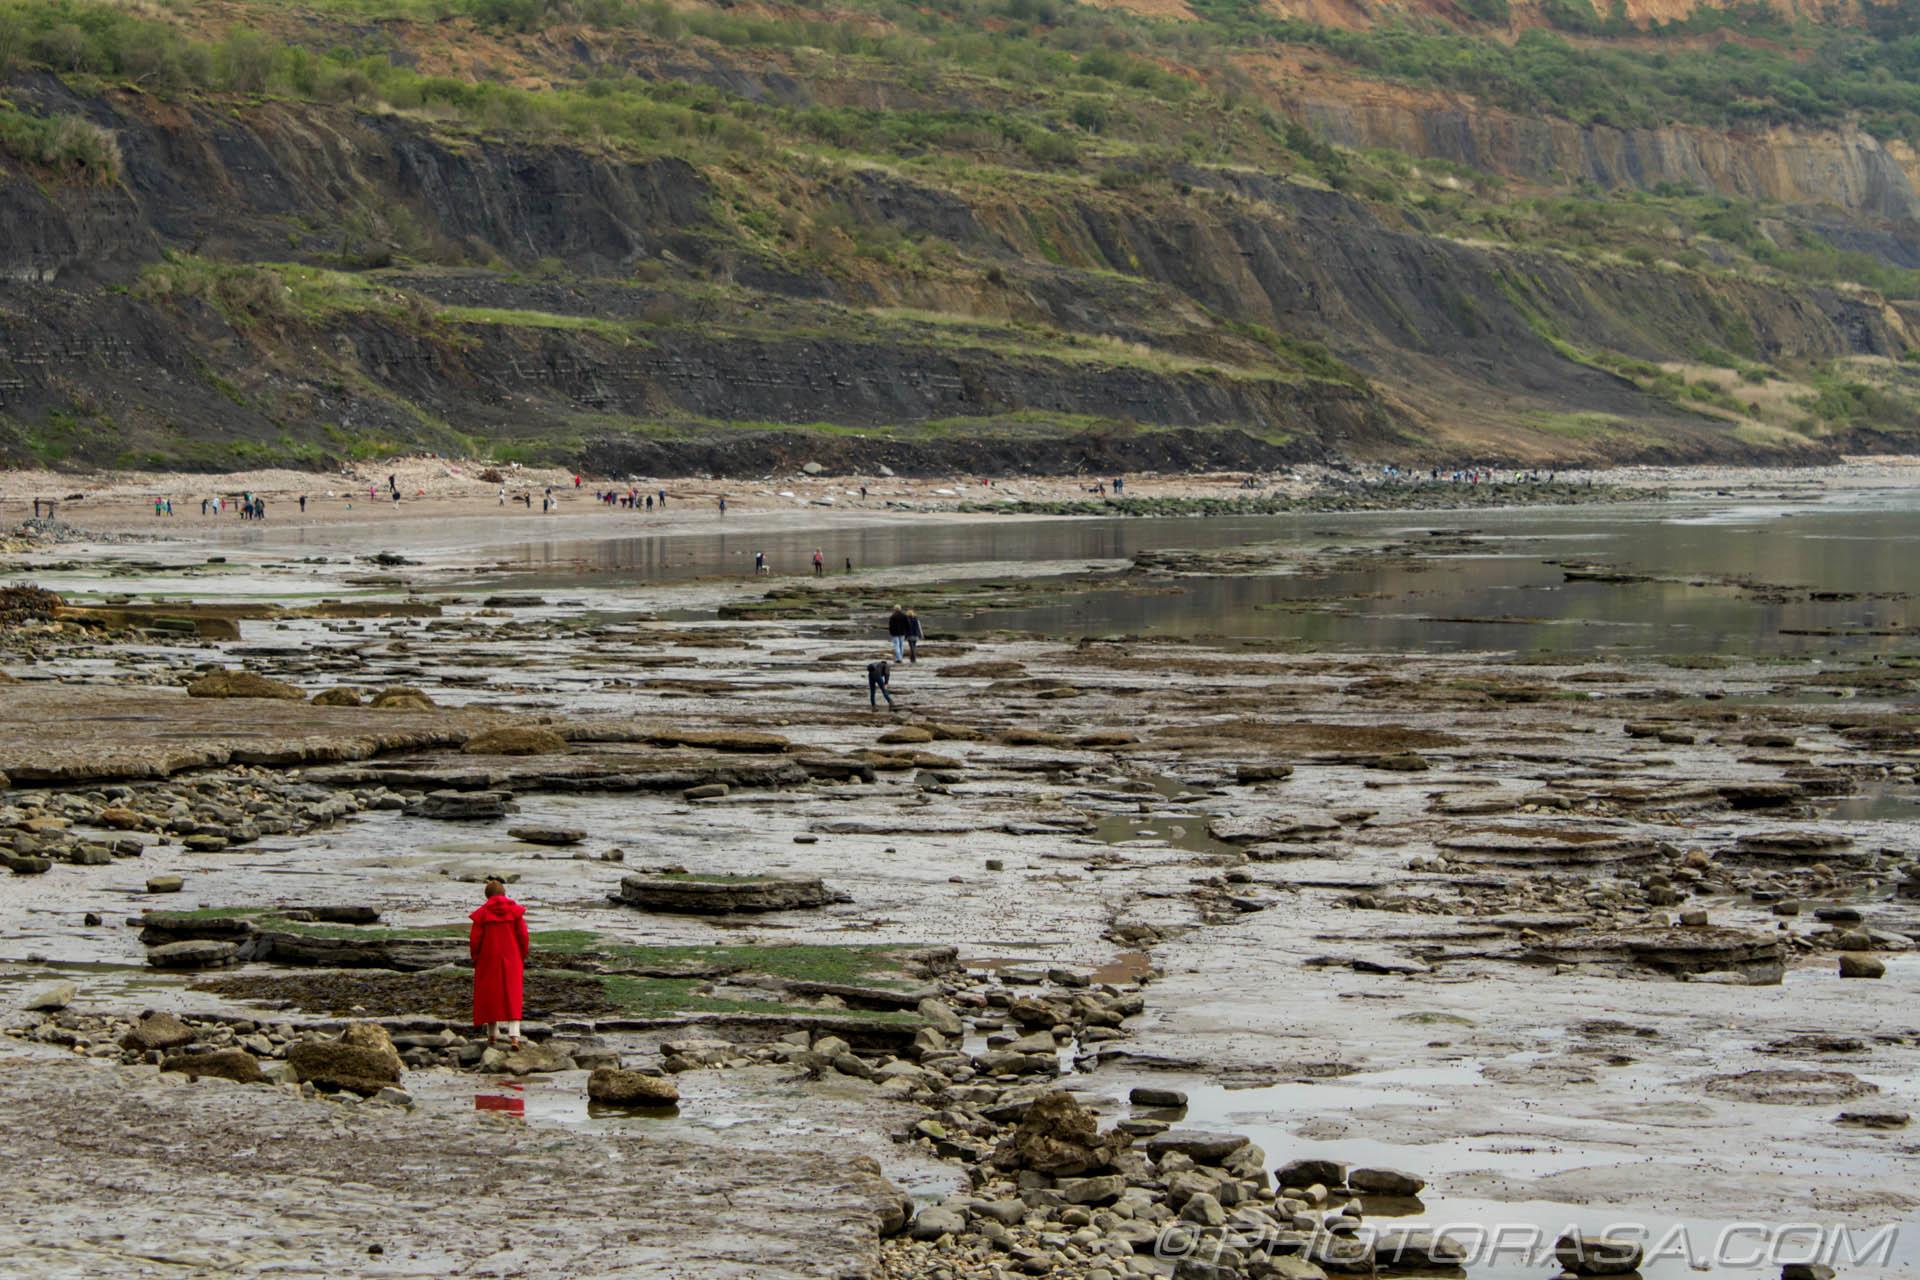 https://photorasa.com/jurassic-coast-lyme-regis/red-woman-and-beachy-rocks/